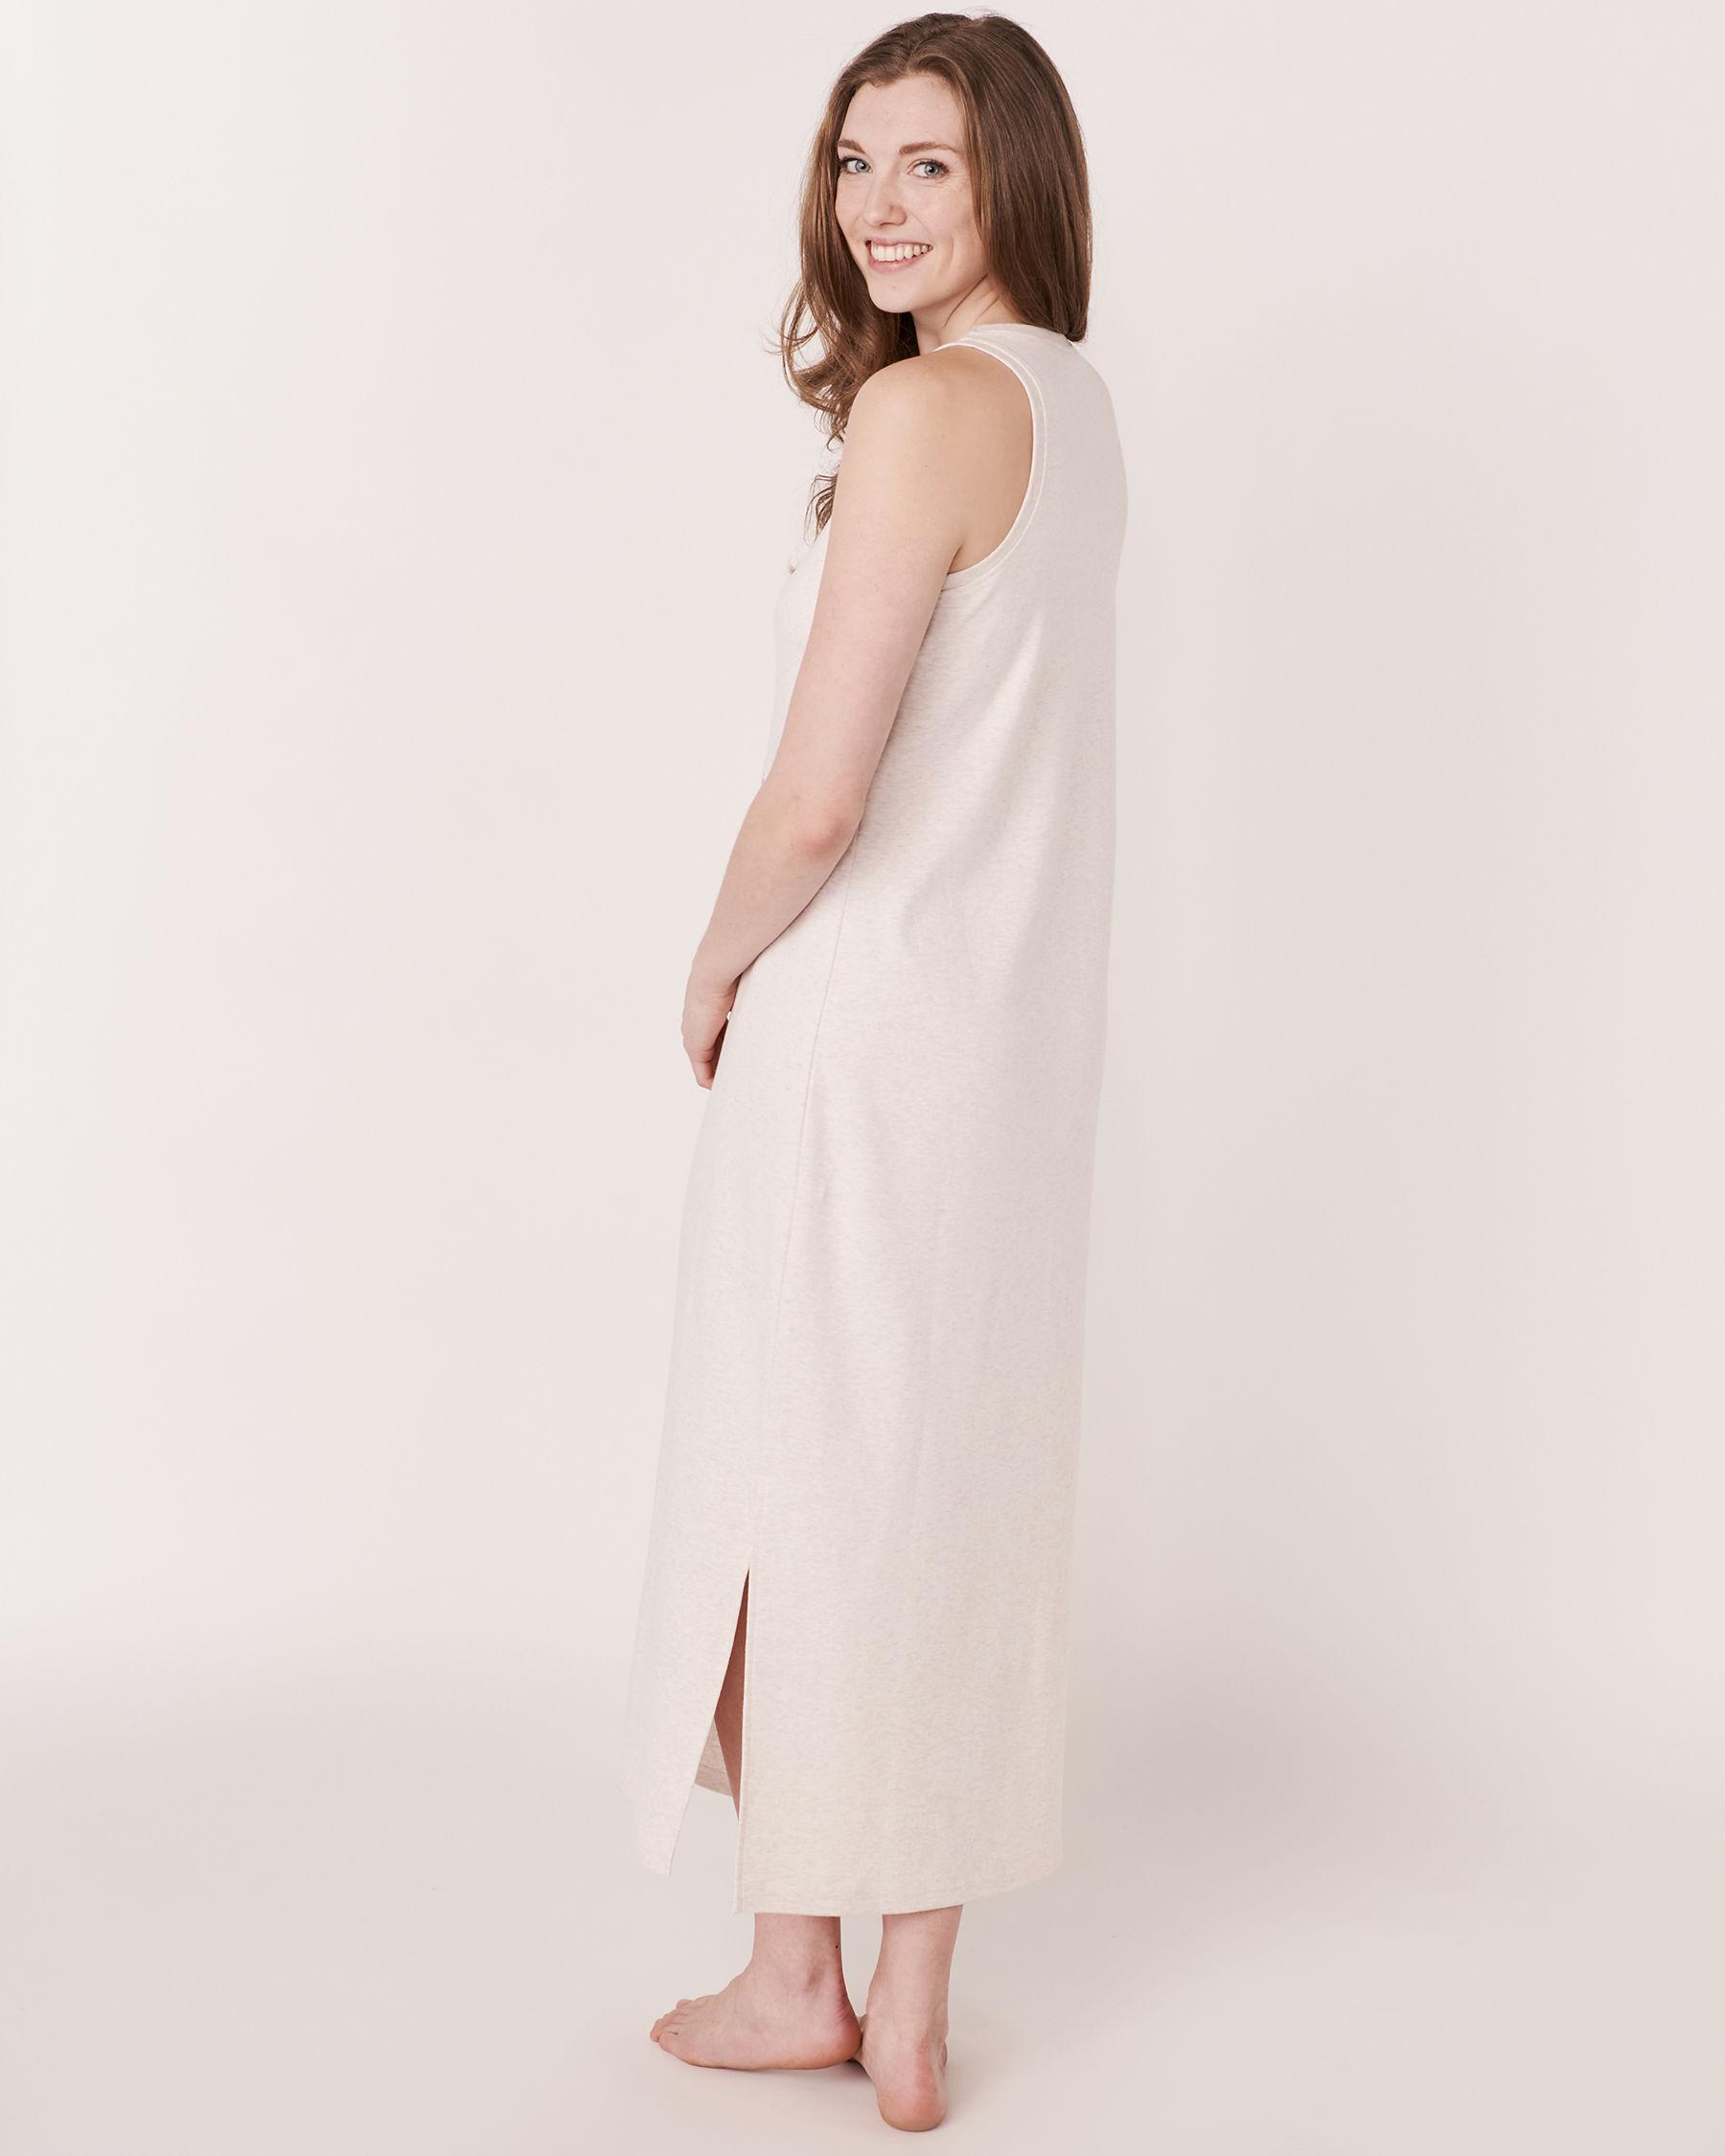 LA VIE EN ROSE Organic Cotton Sleeveless Long Sleepshirt Soft grey 40500002 - View4